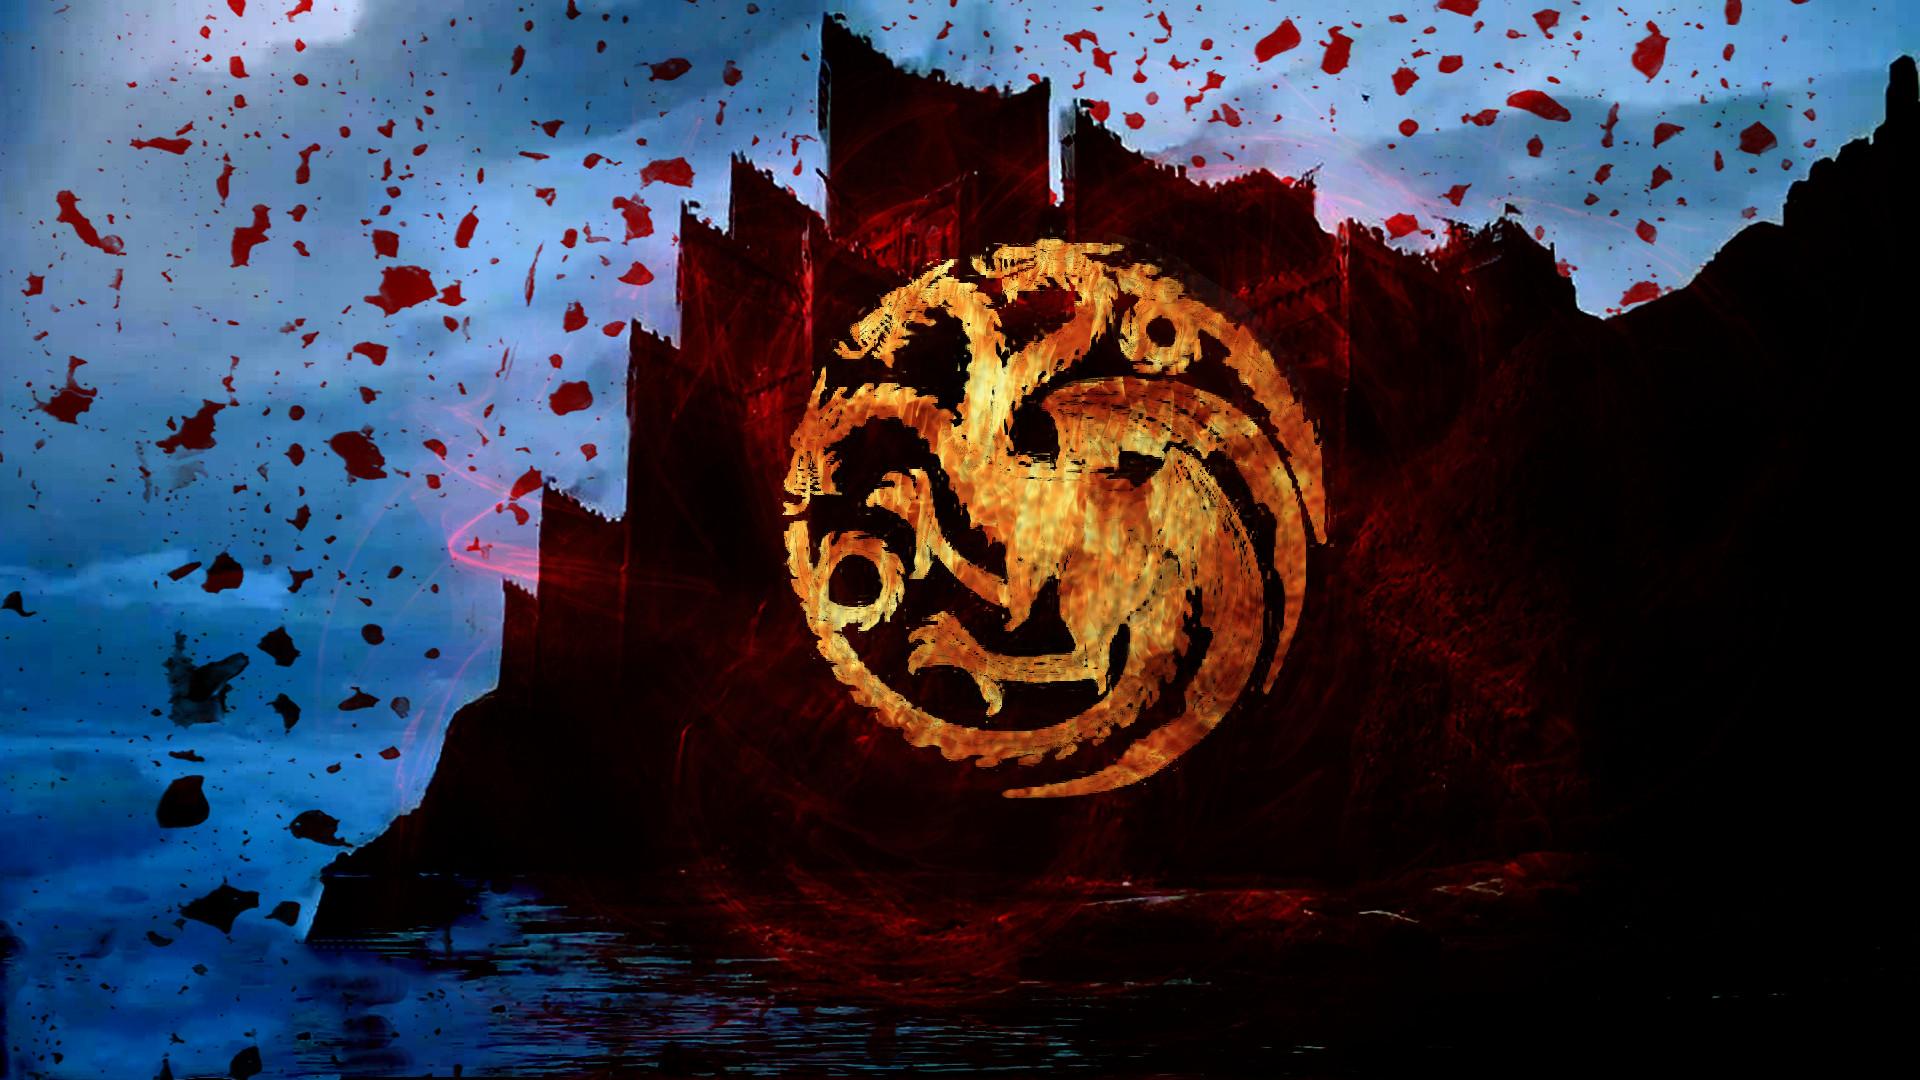 House Targaryen Wallpaper 72 Images - Game Of Thrones House Targaryen Desktop , HD Wallpaper & Backgrounds